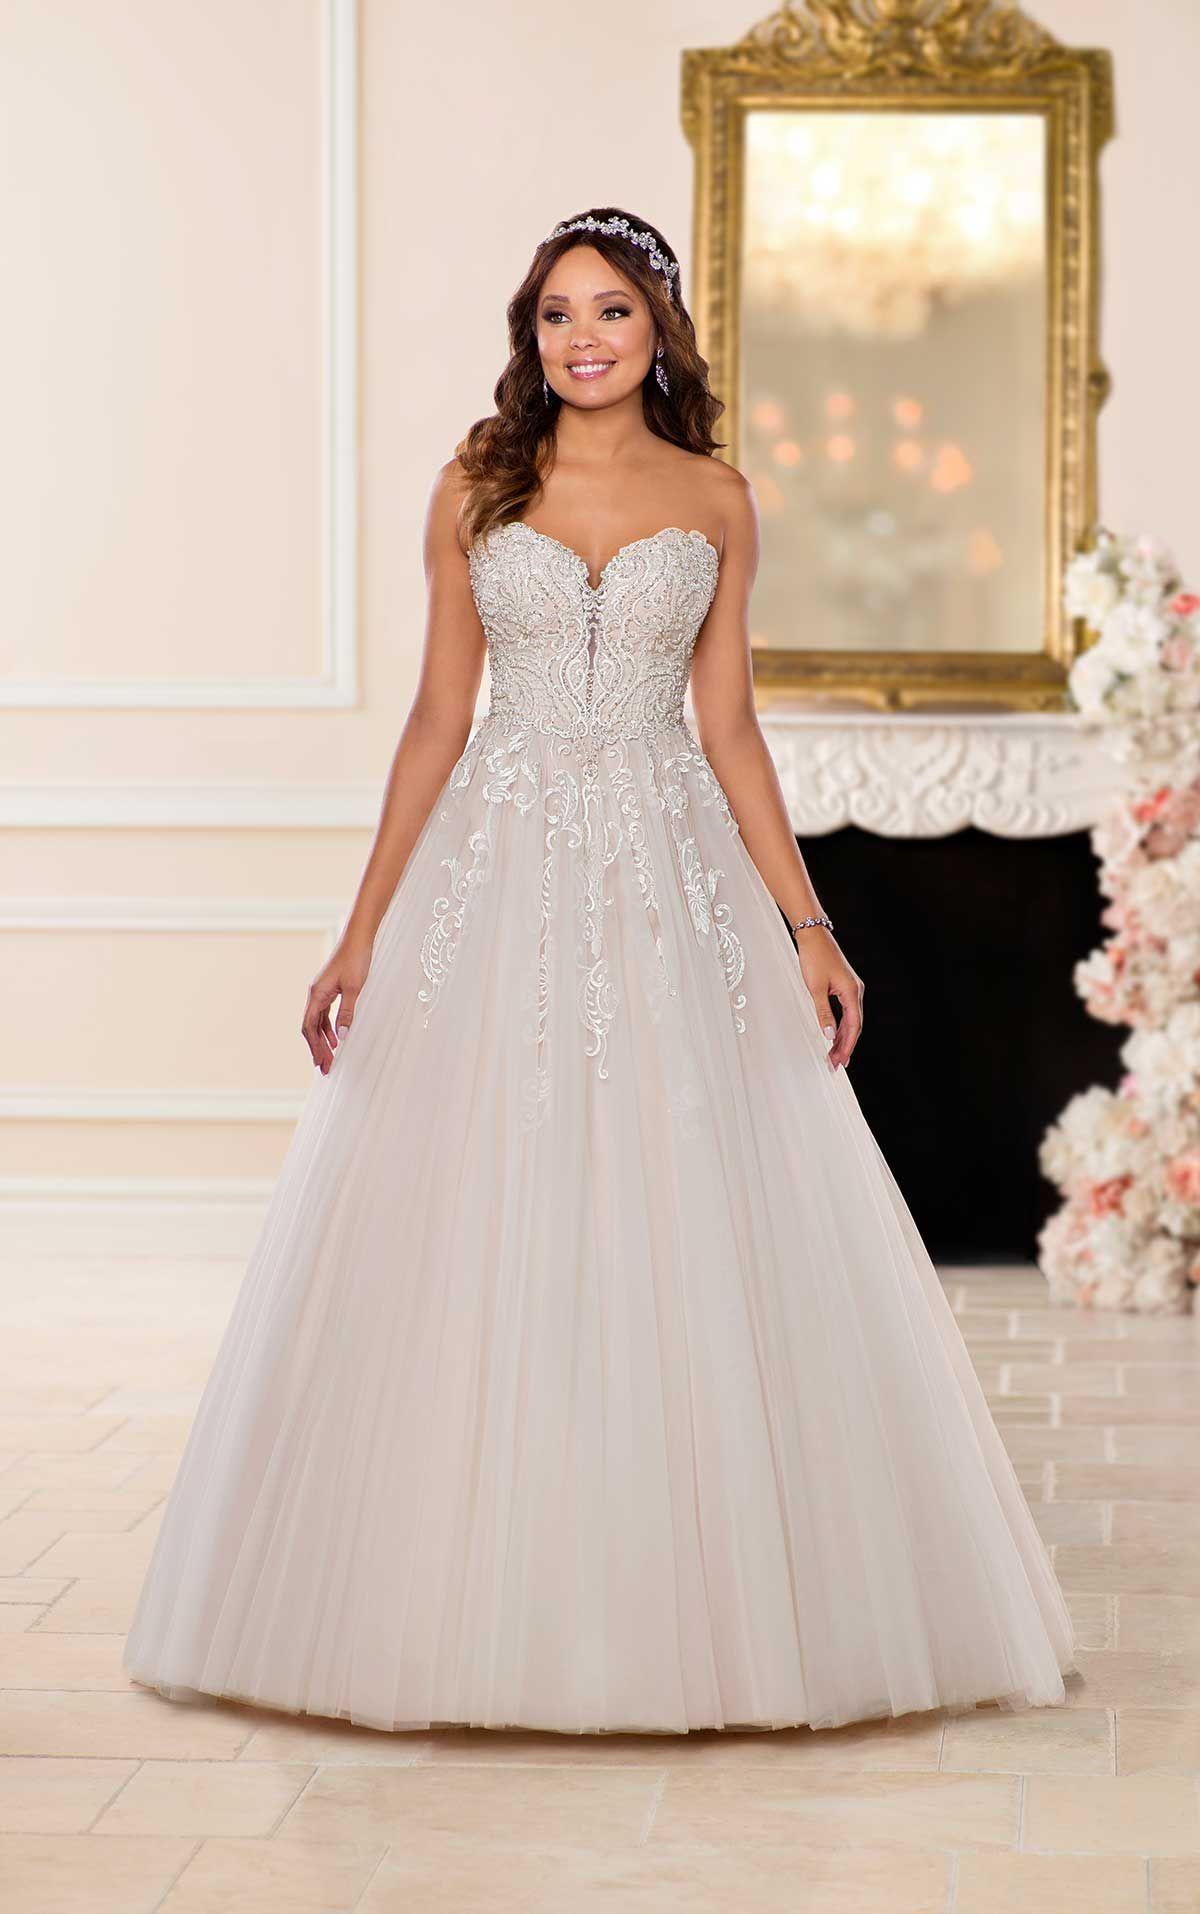 505f7473906 Designer Princess Wedding Dress in 2019